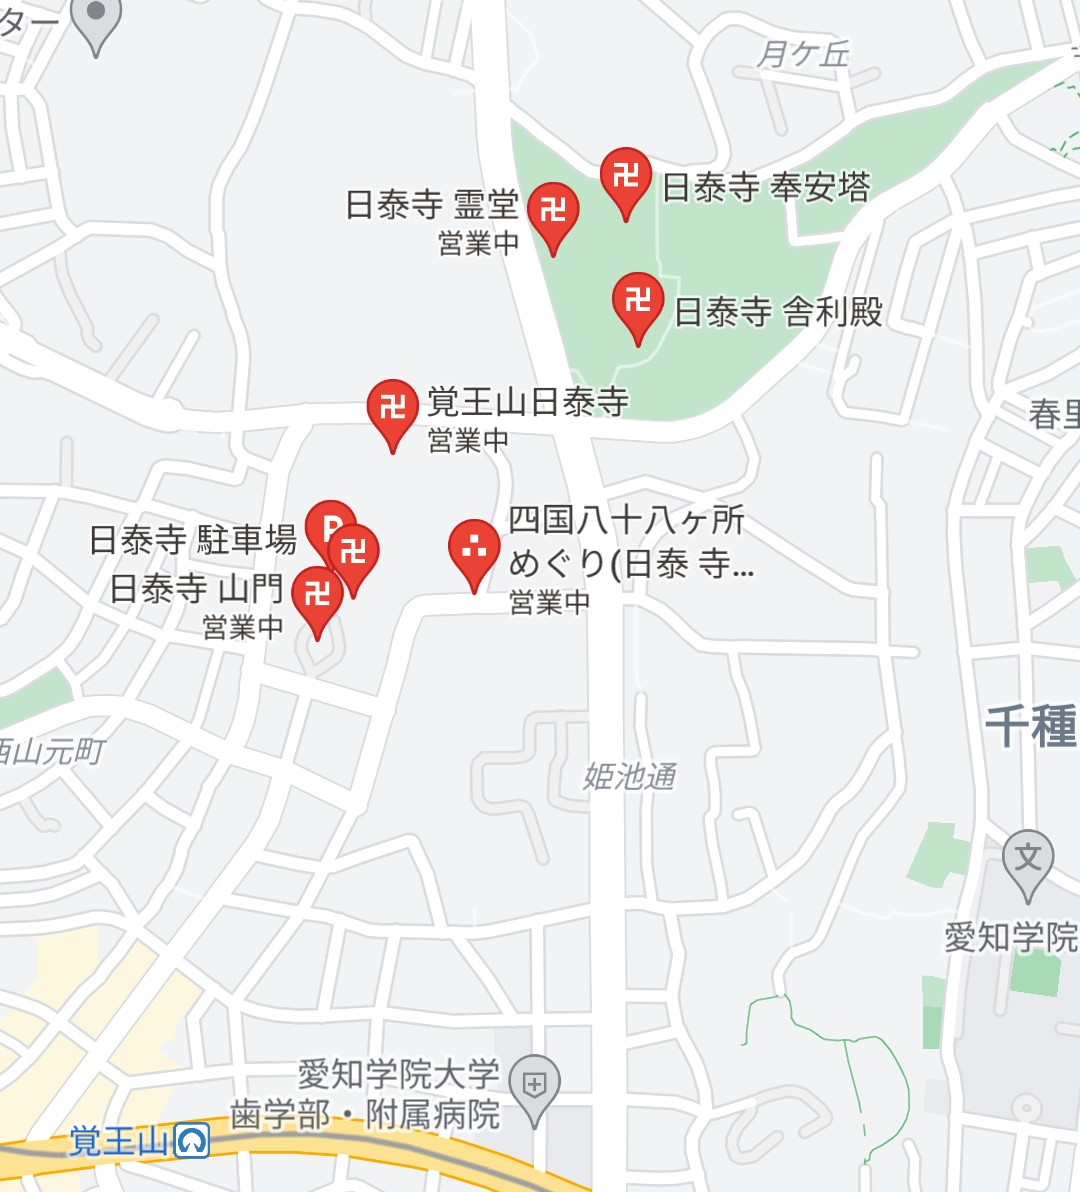 f:id:hinoki_kaonashi:20210924144318j:plain